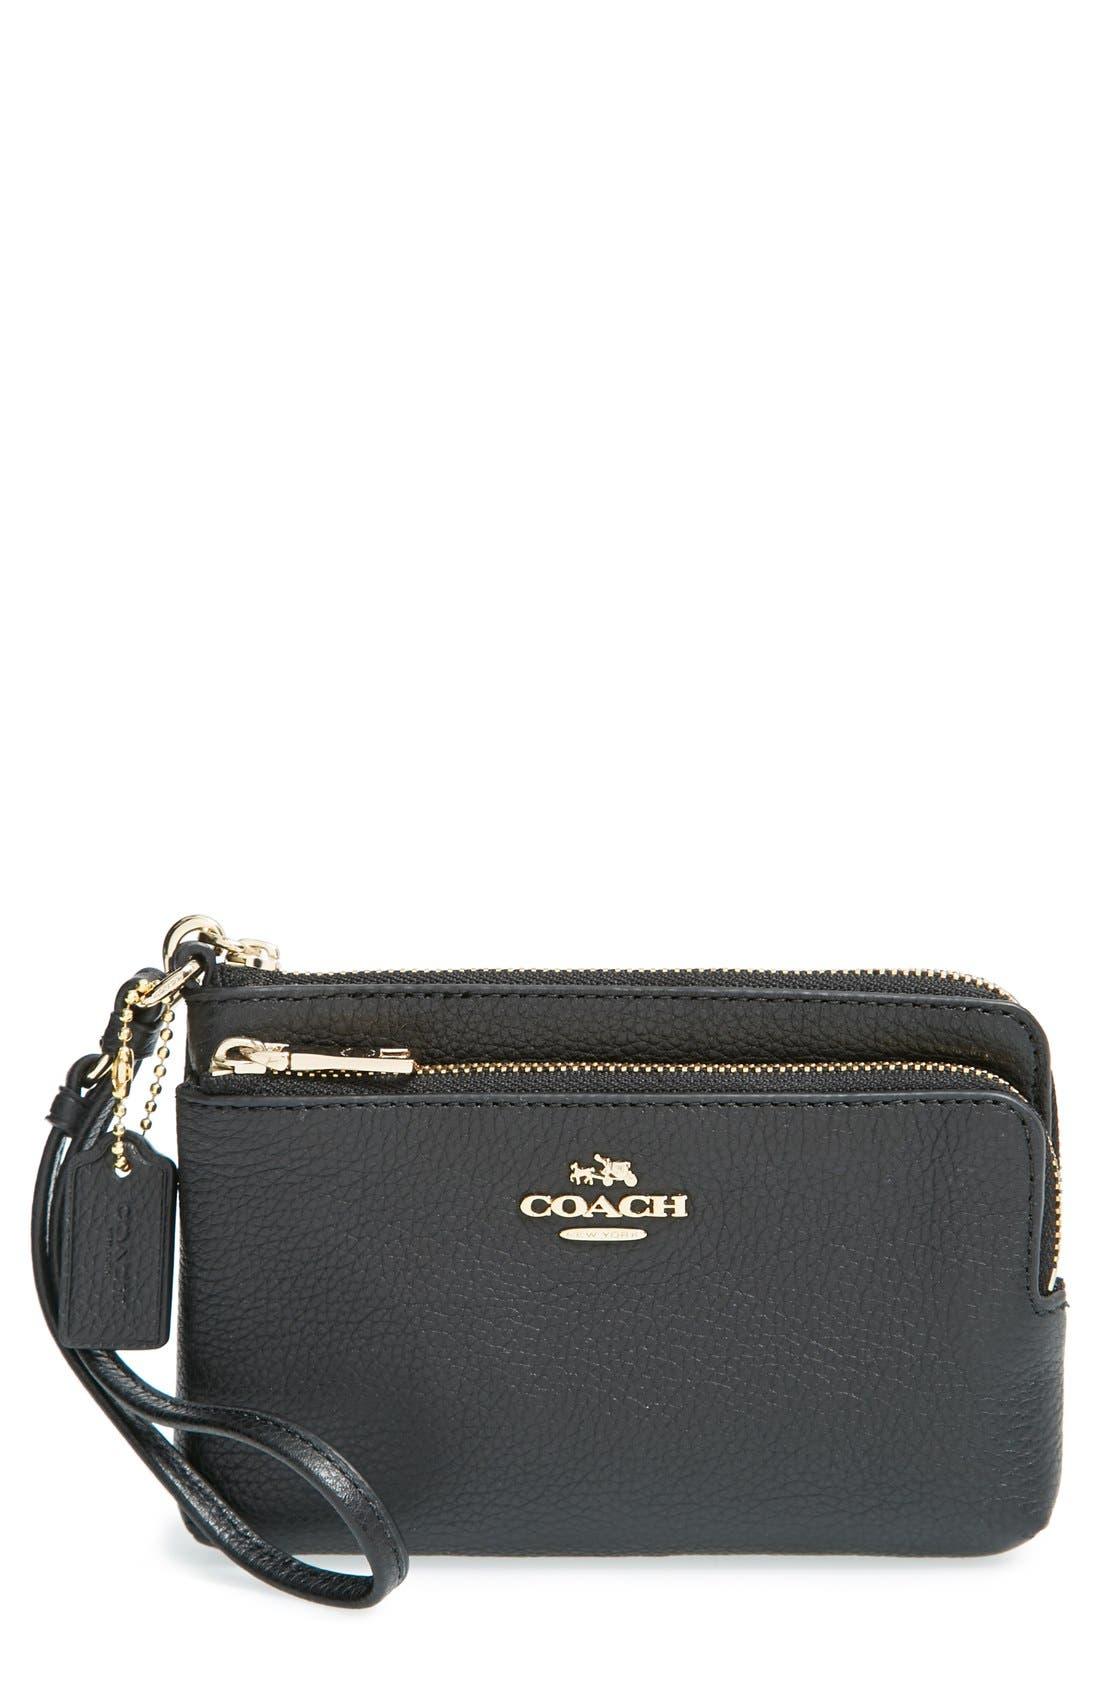 COACH, 'Madison' Double Zip Leather Wallet, Main thumbnail 1, color, 001